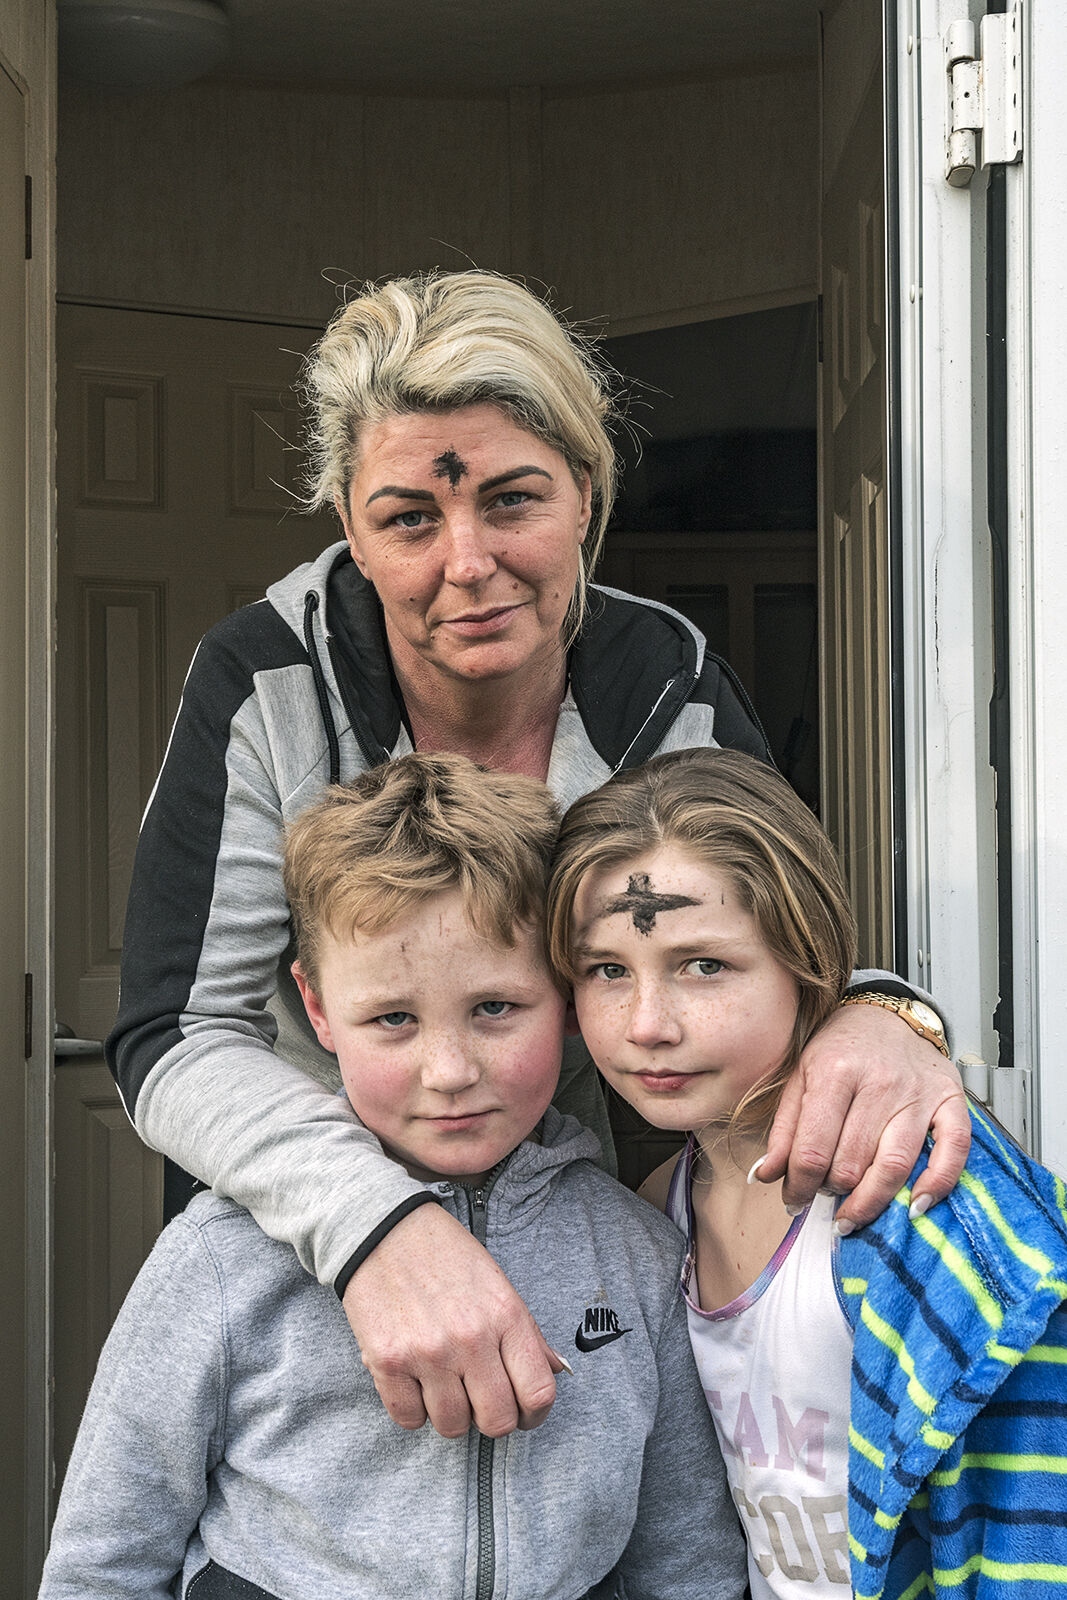 Mother and her children, Cork, Ireland 2020